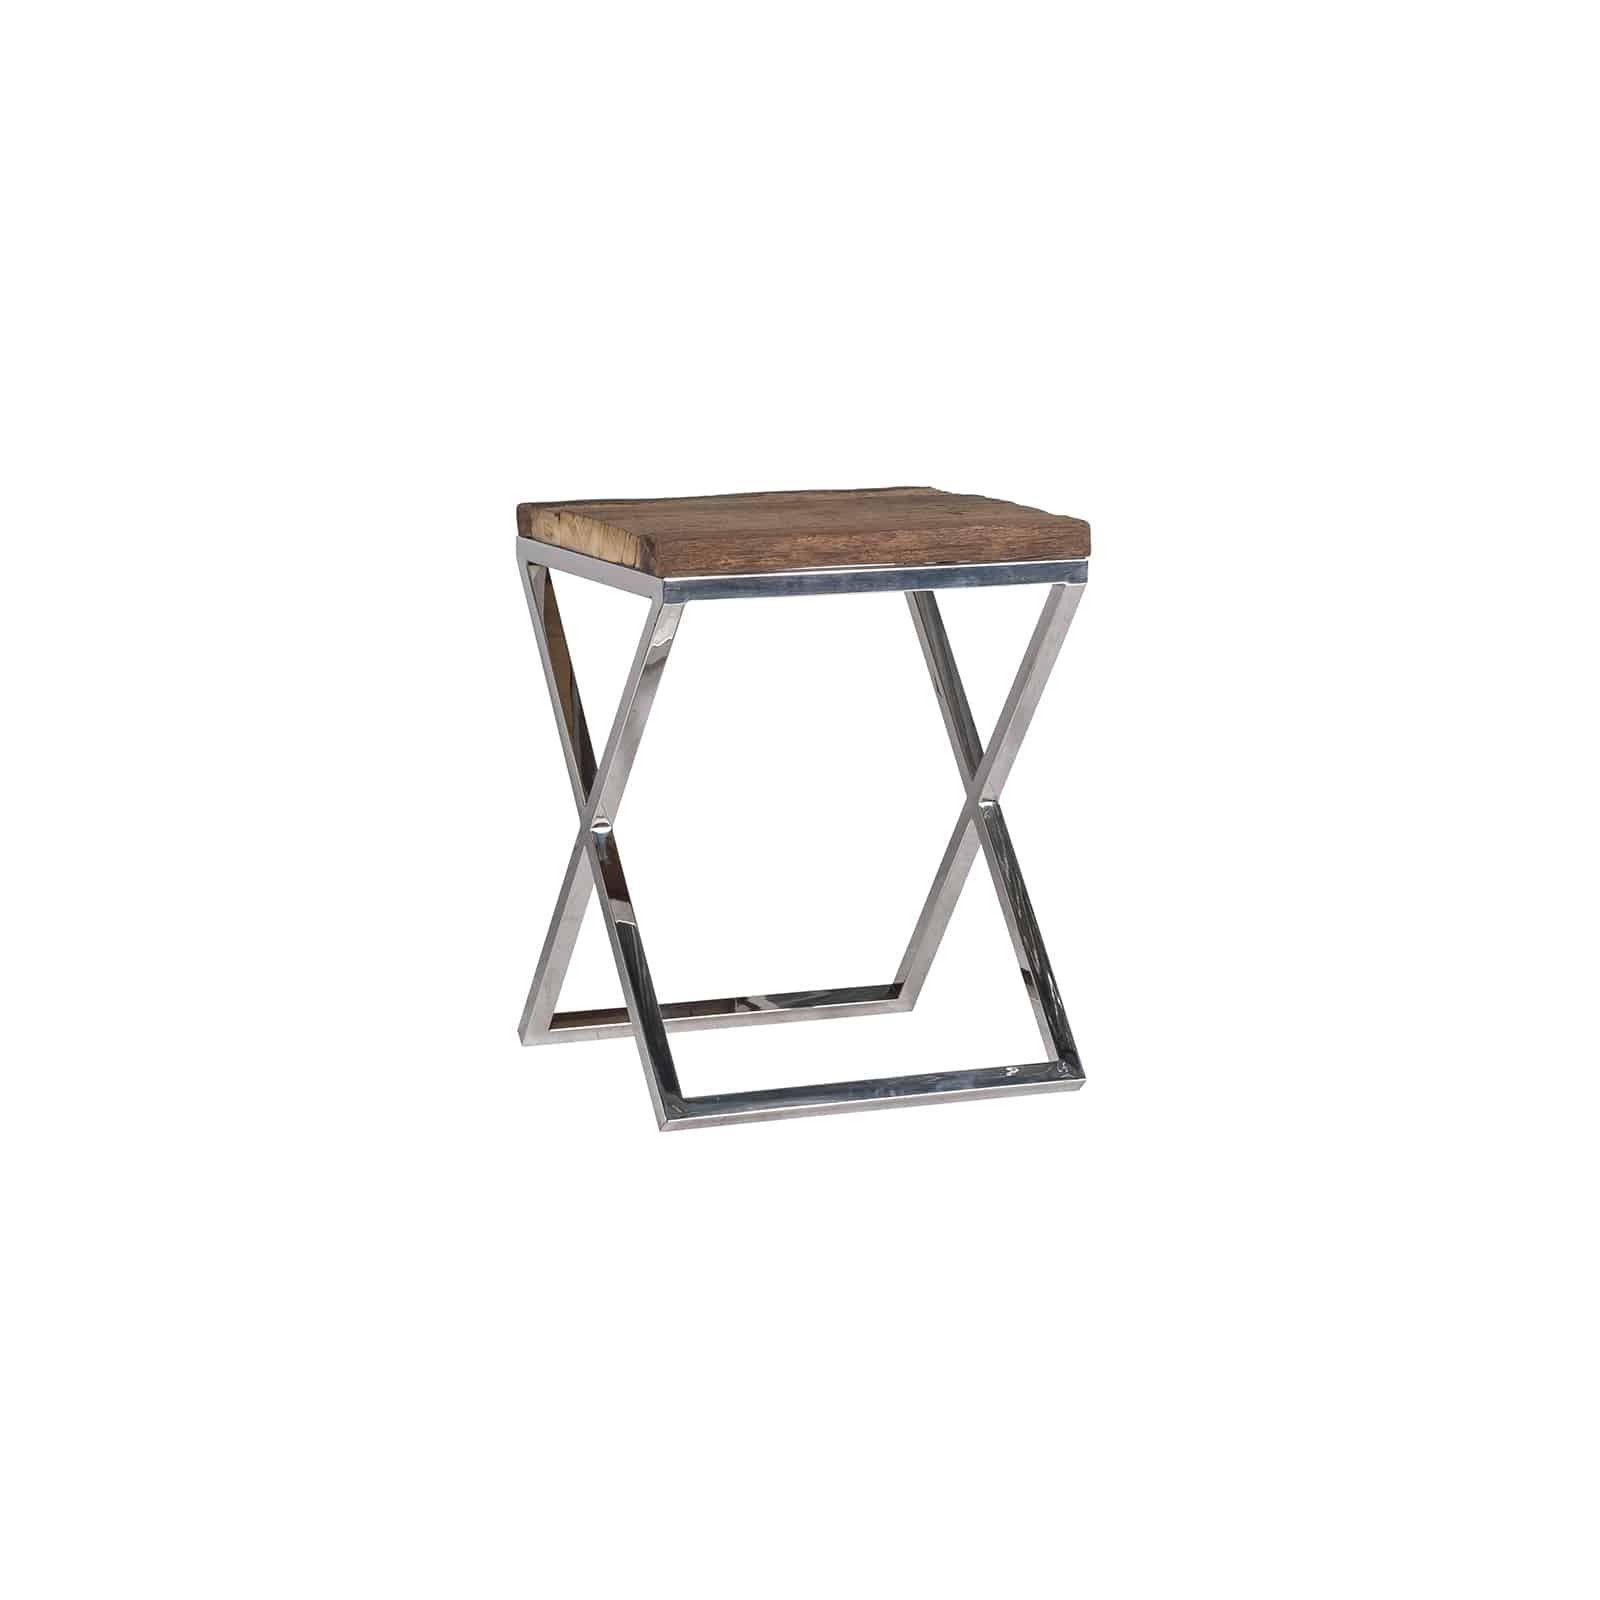 Table d'angle Kensington 45x45 Meuble Déco Tendance - 60